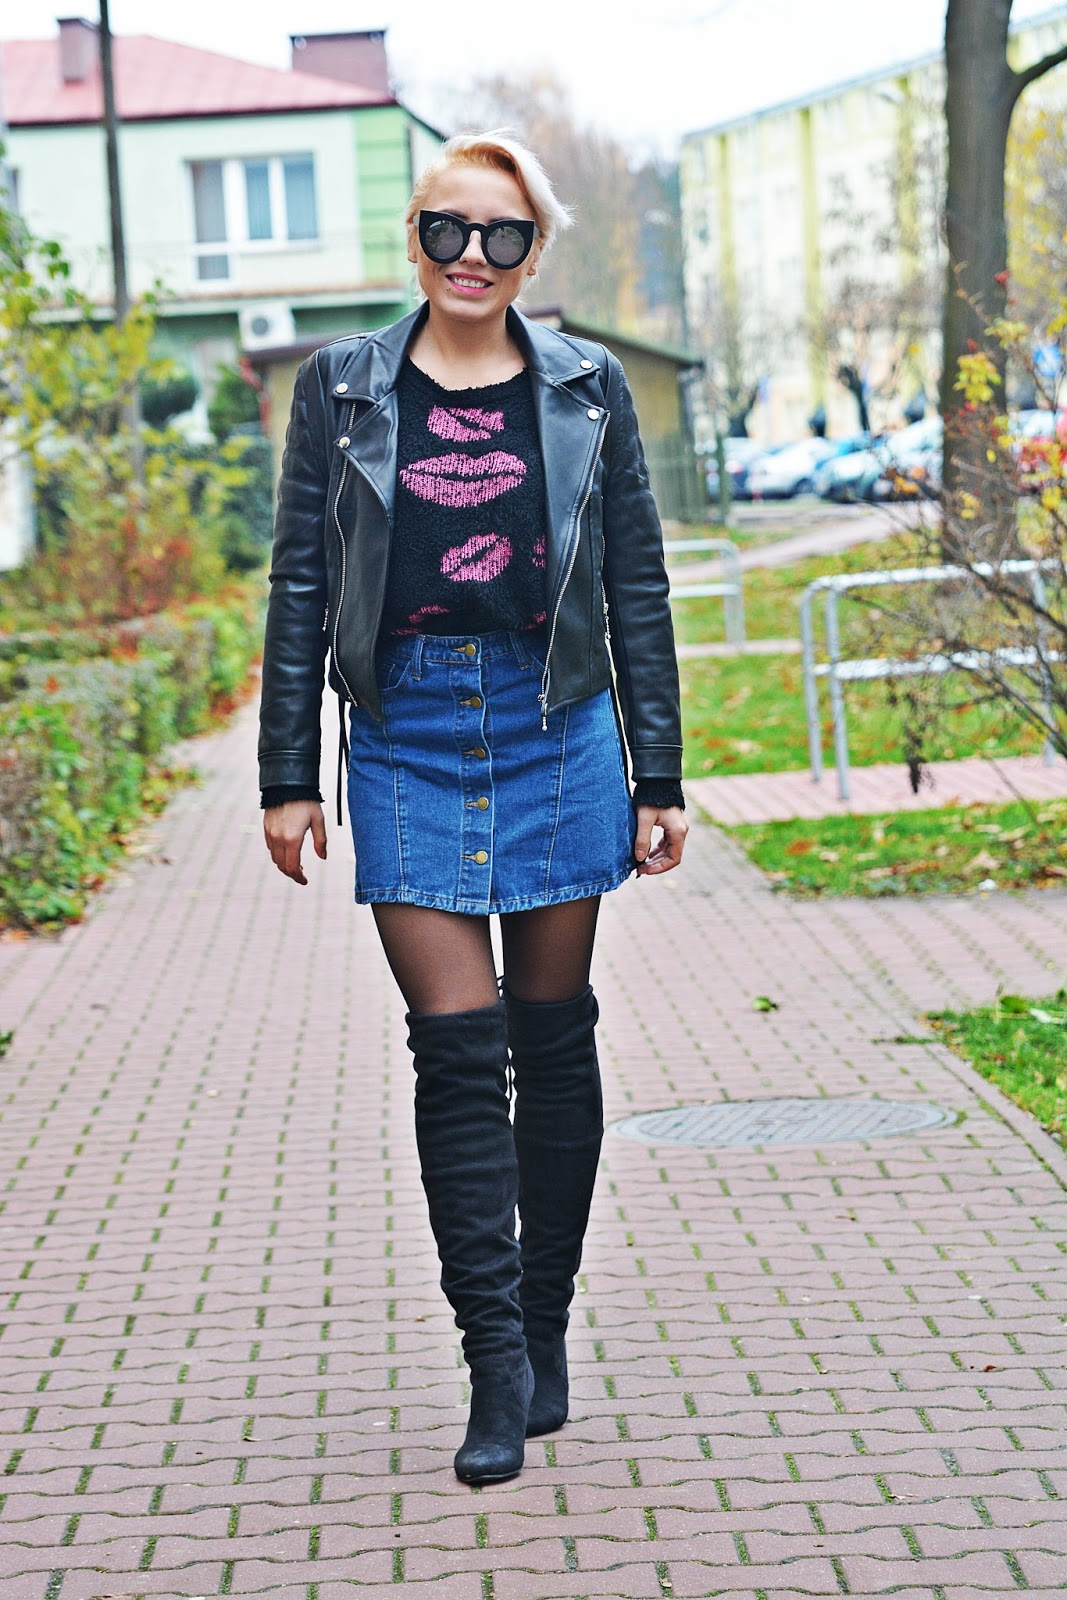 jeansowa_spodnica_skorzana_ramoneska_buty_za_kolano_karyn6